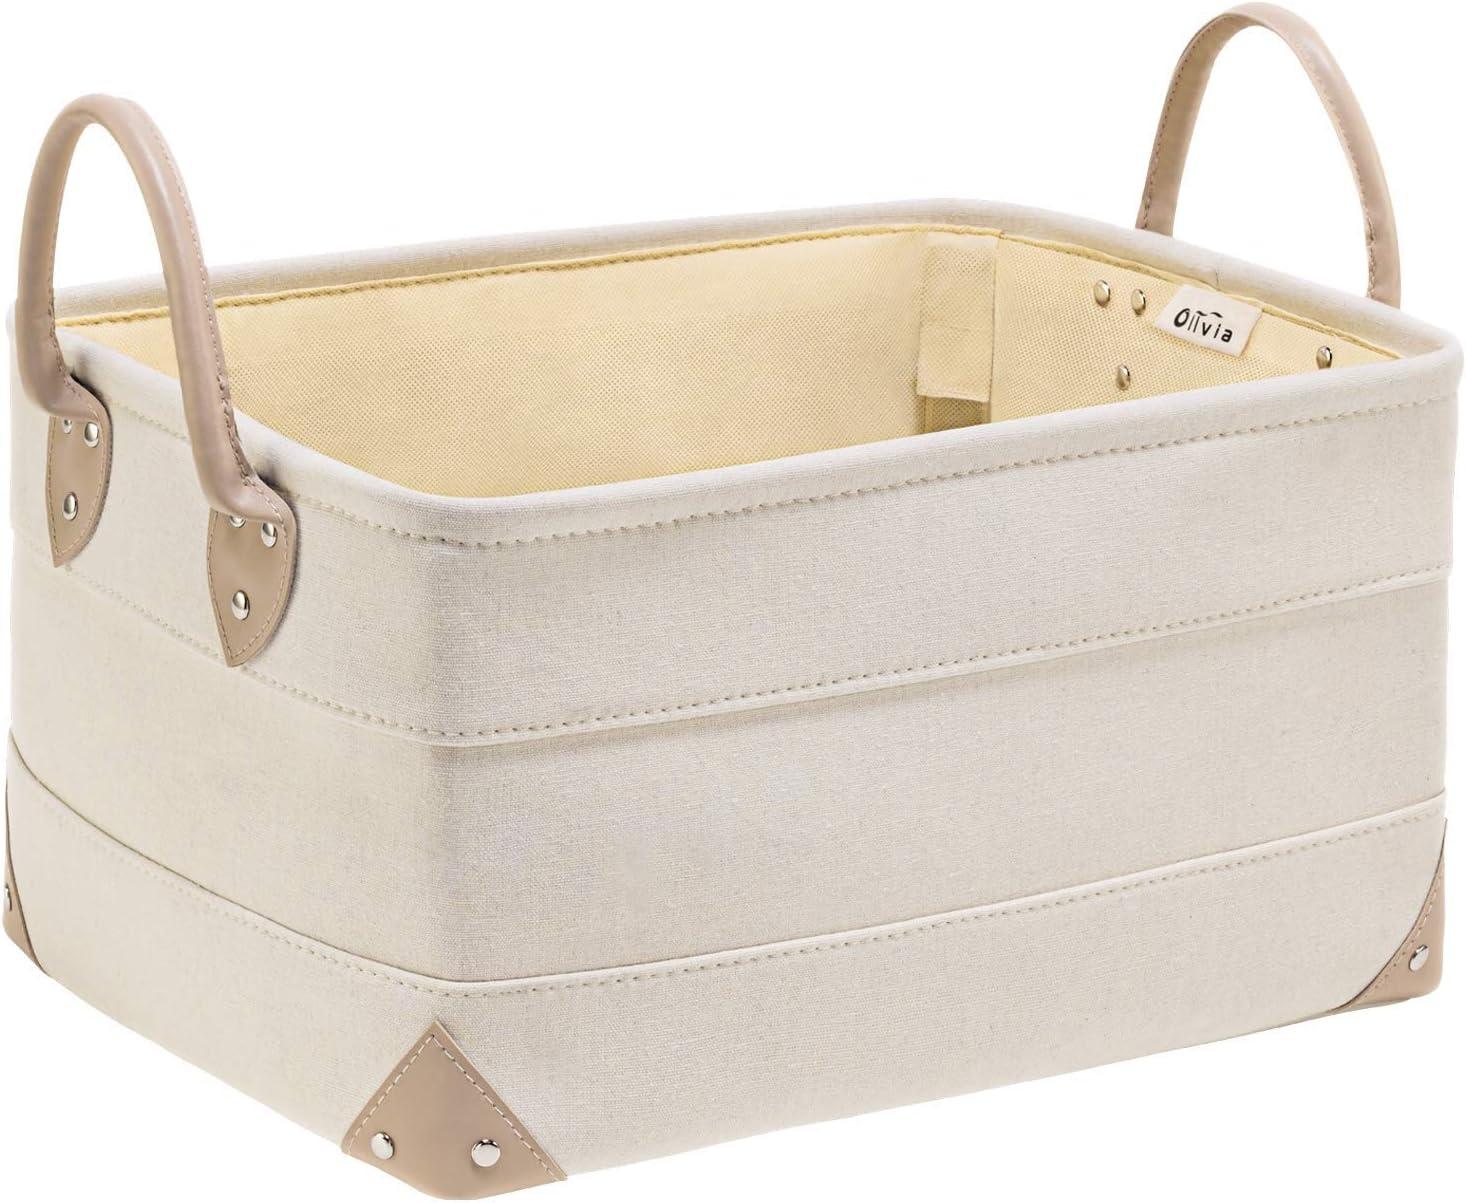 "OLLVIA Decorative Fabric Storage Bins Basket, 15.7x11.8x8.3"" Large Canvas Laundry Room Storage, Fabric Storage Baskets for Closet Shelves, Foldable Storage Bin for Organizing Shelf Nursery Office"